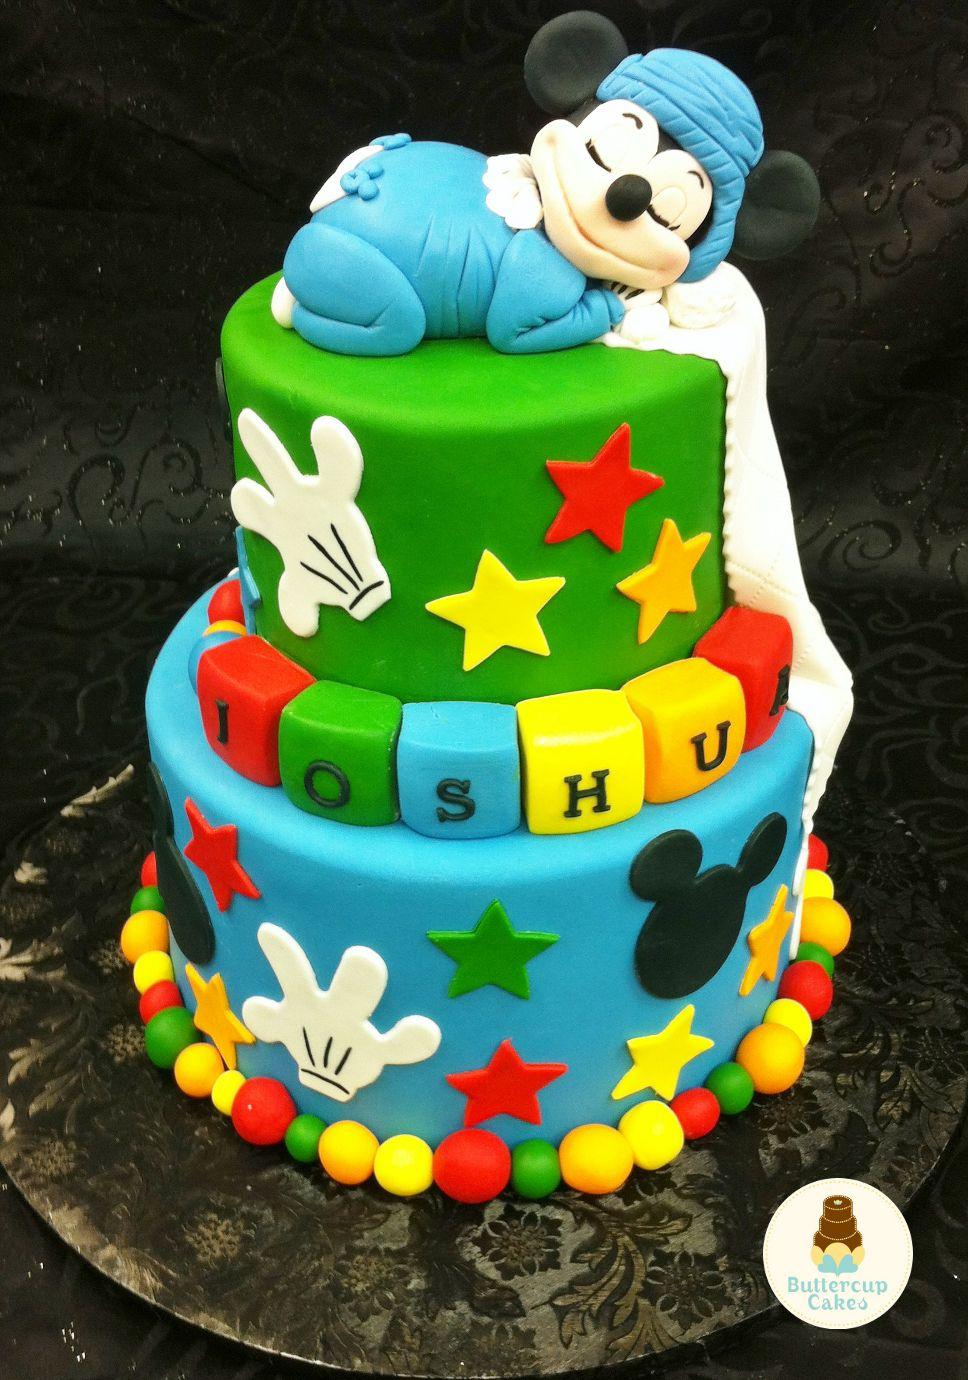 Mickey Mouse Birthday Cake Cartoon & Character Cakes